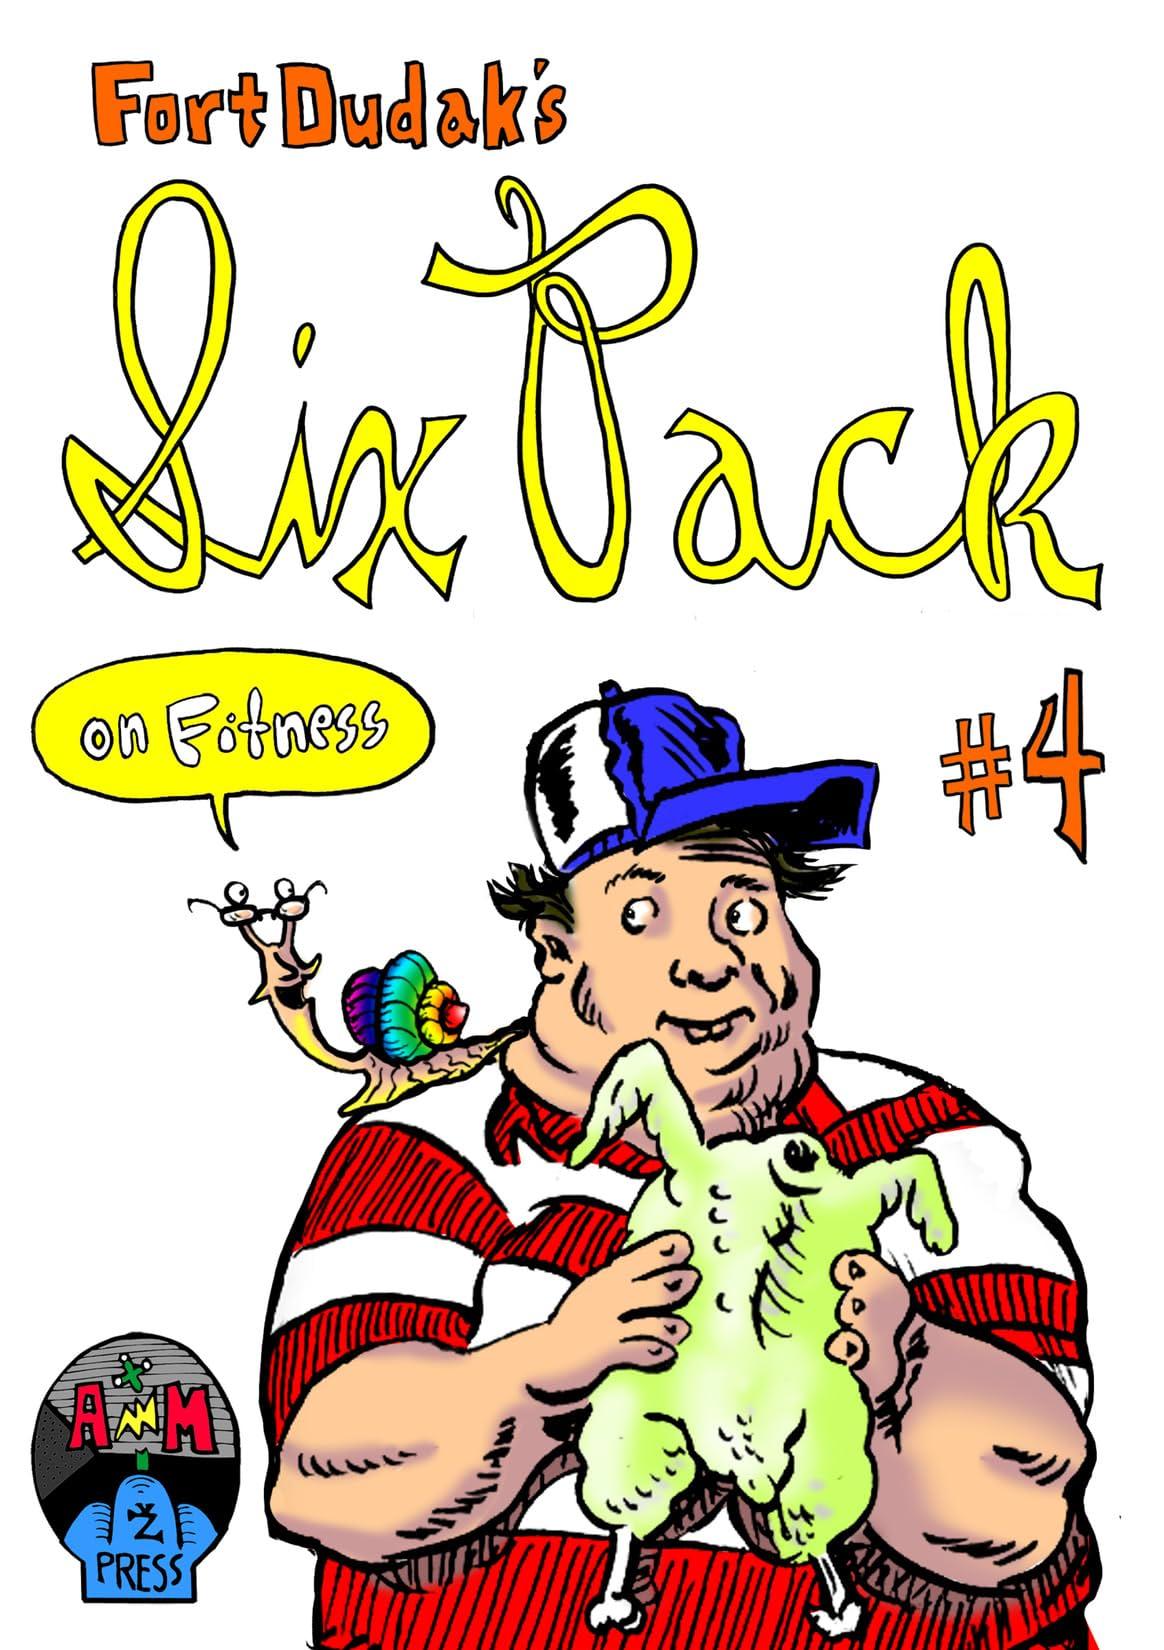 Fort Dudak's Six Pack #4